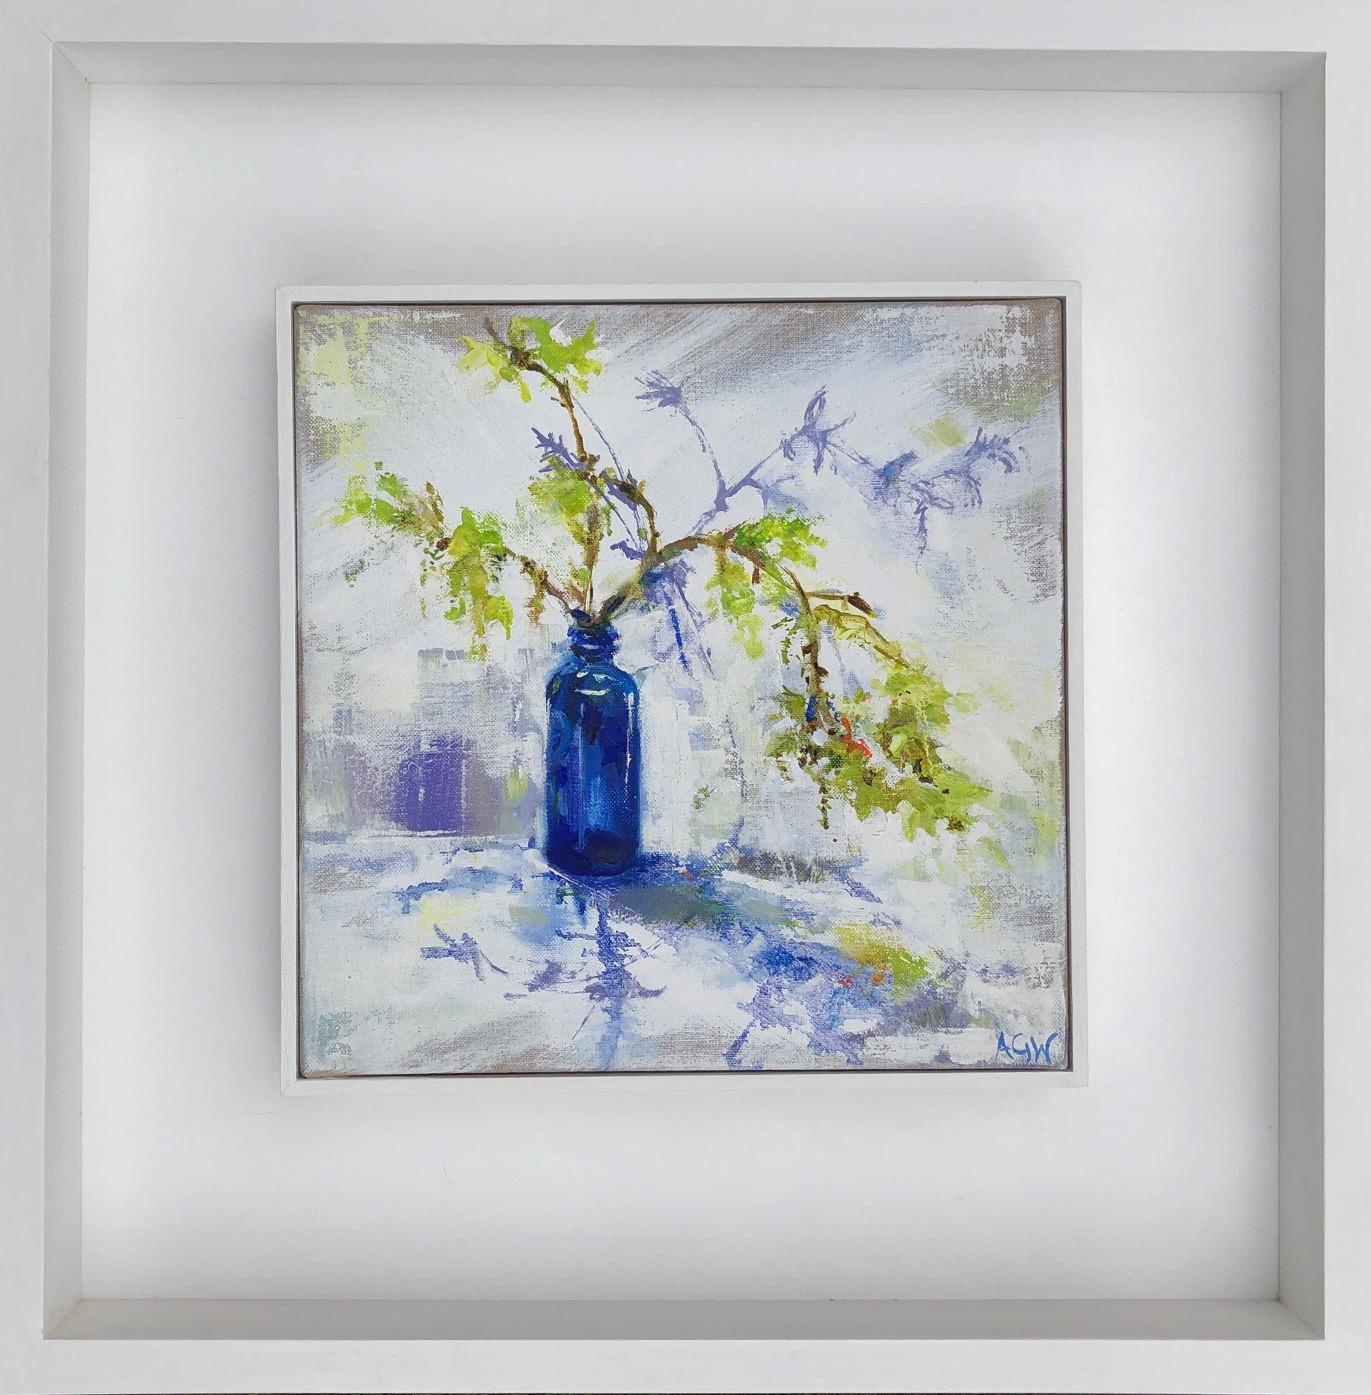 Blue Bottle and Spring Green BY ANGELA GORDON-WEBB, Original Still Life Painting